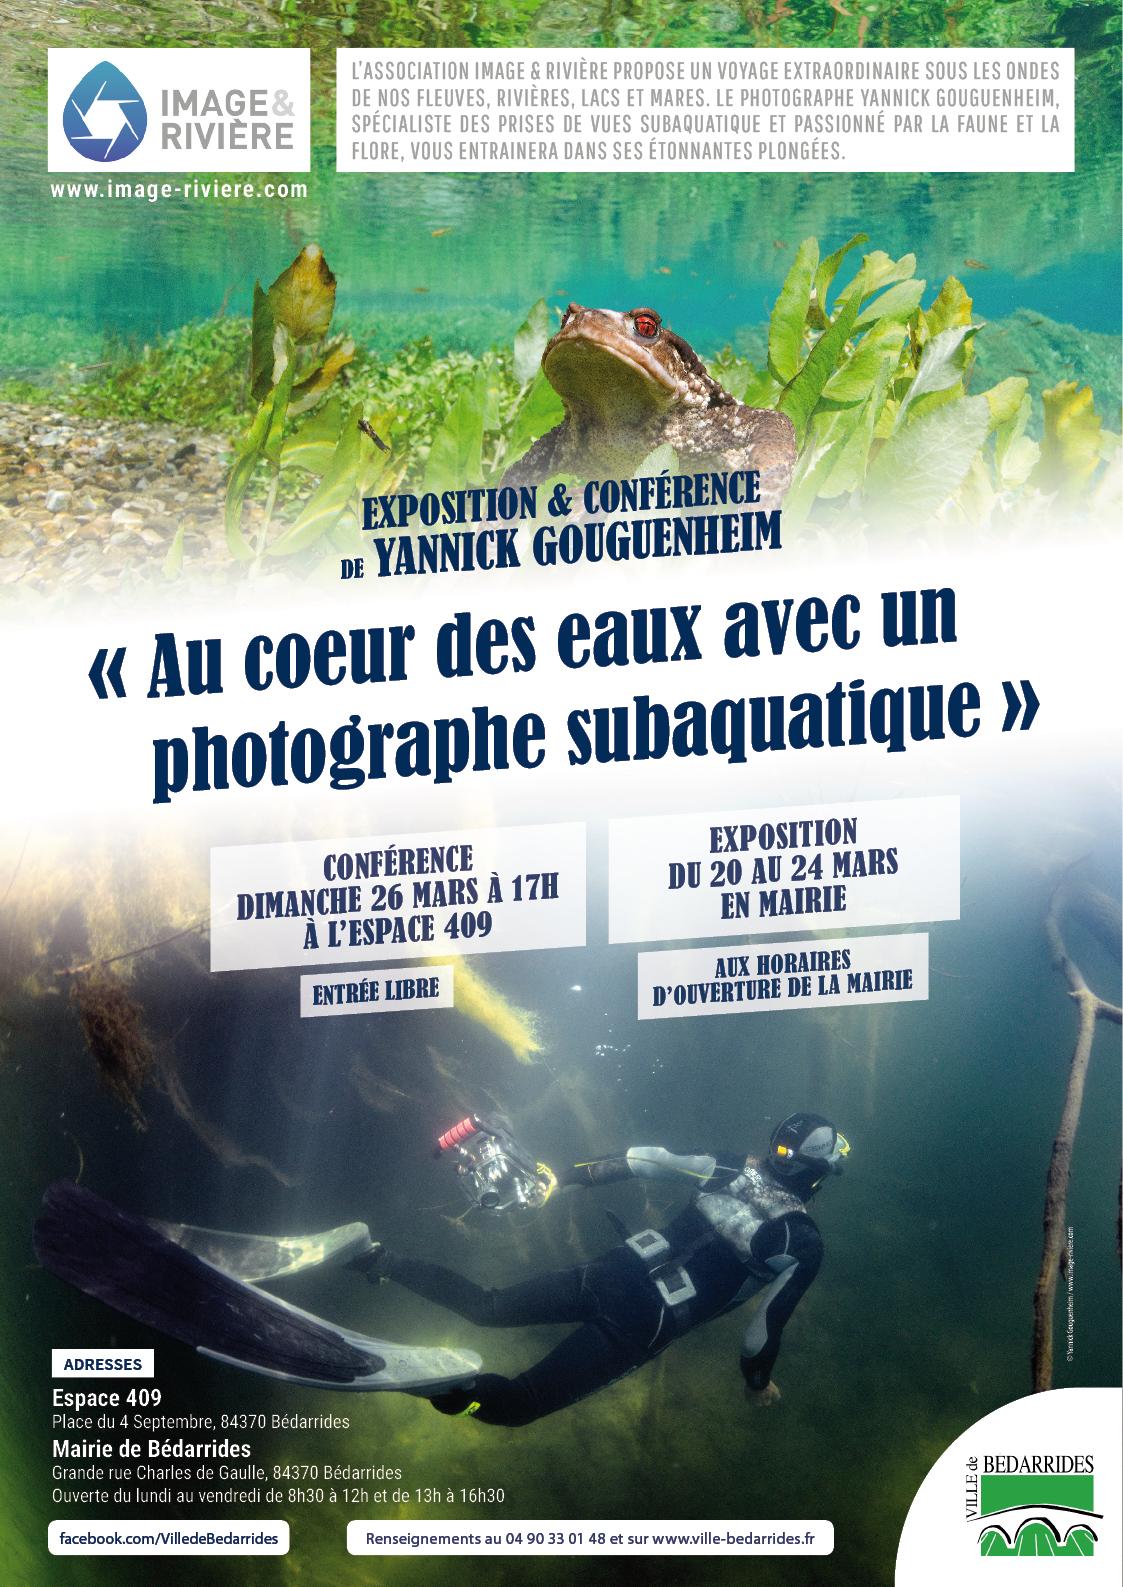 Conférence photos subaquatiques 26 mars